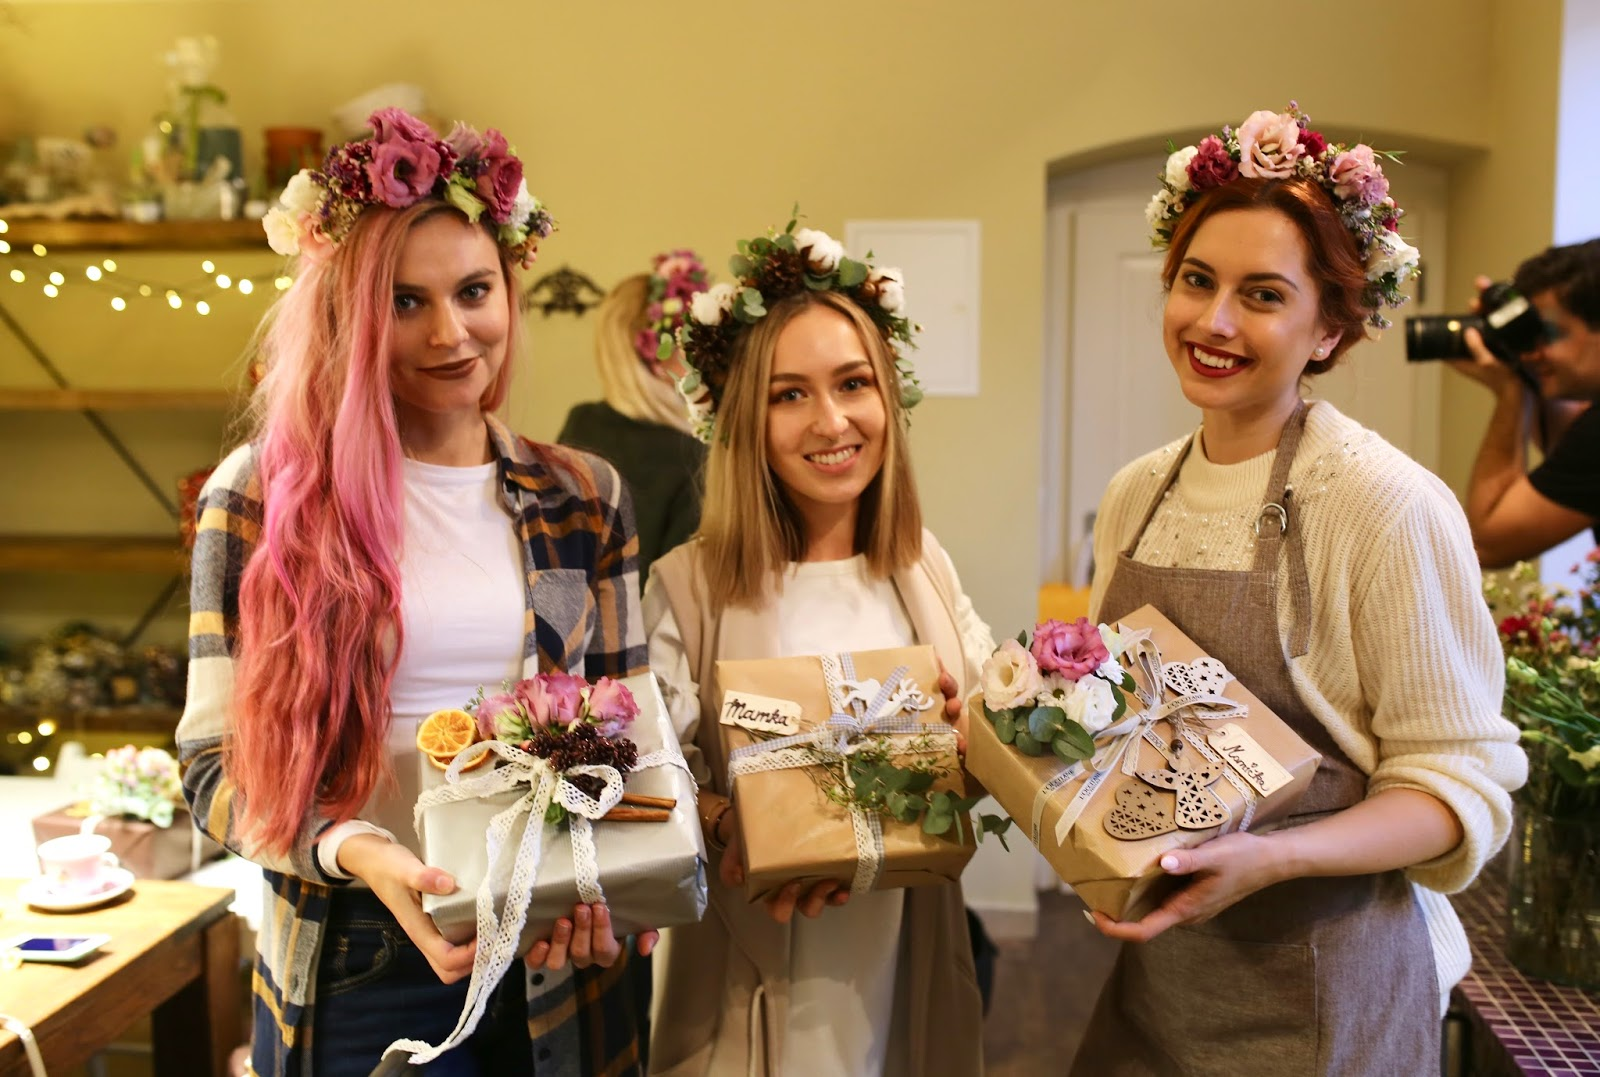 beauty and fashion slovak blogger